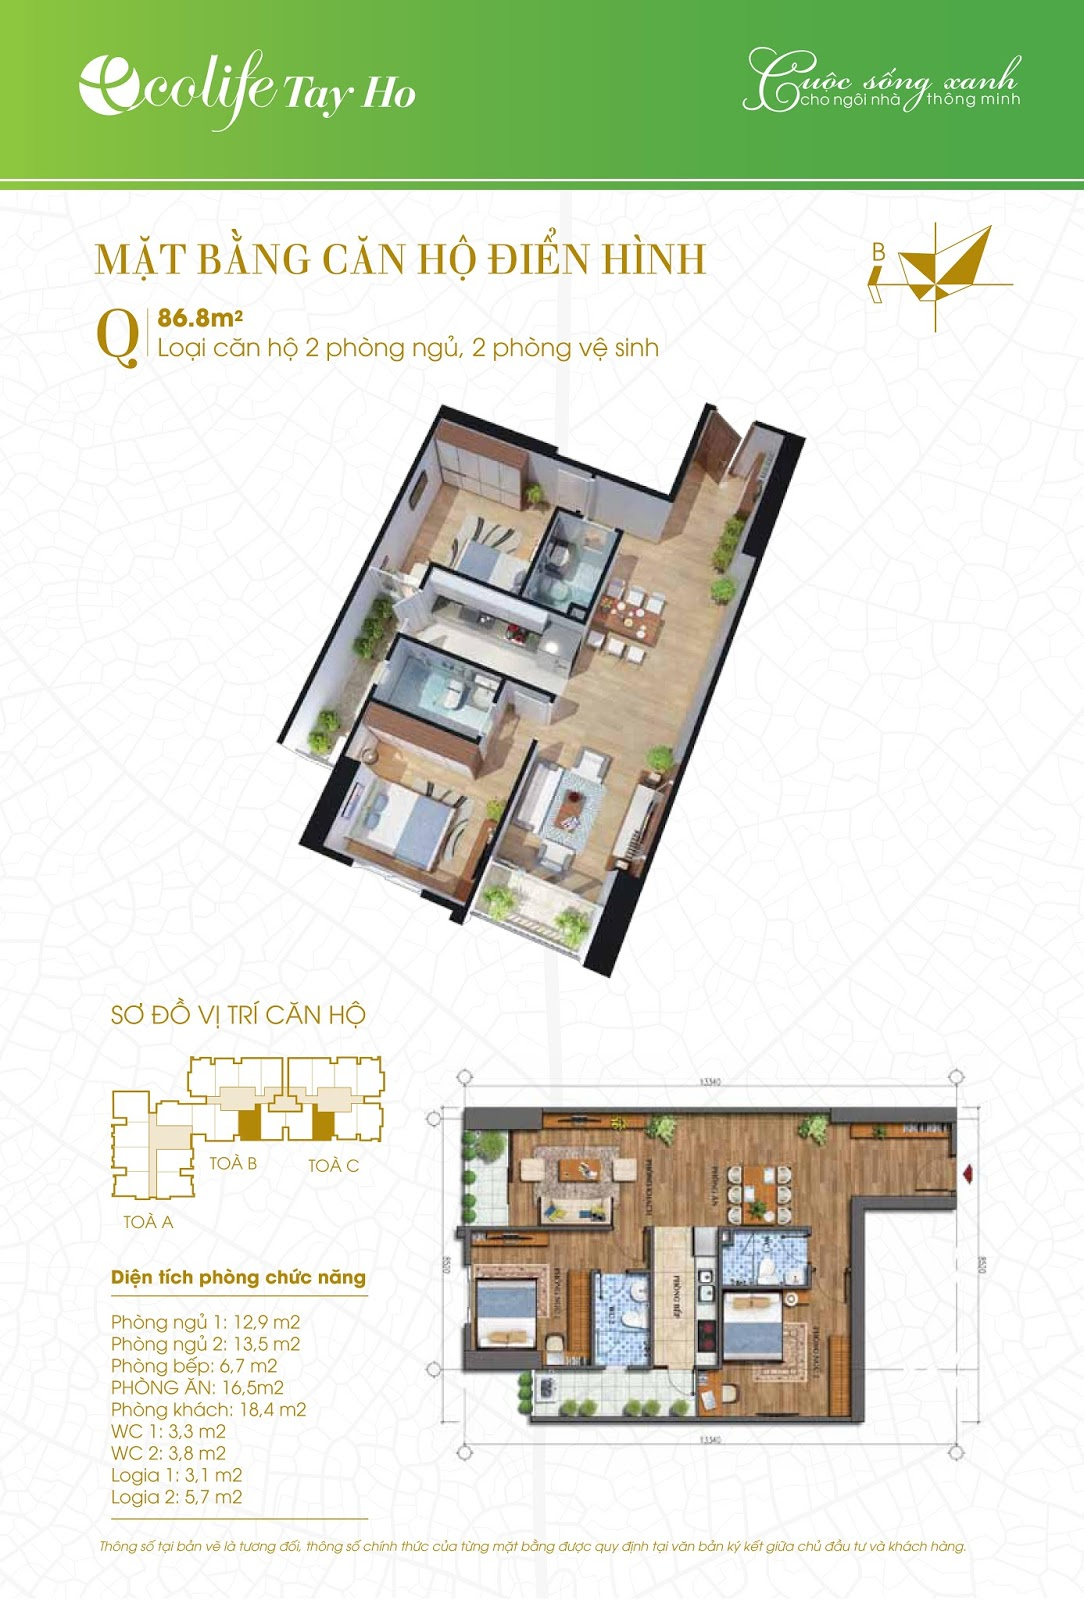 can-ho-q-868-m2-ecolife-tay-ho